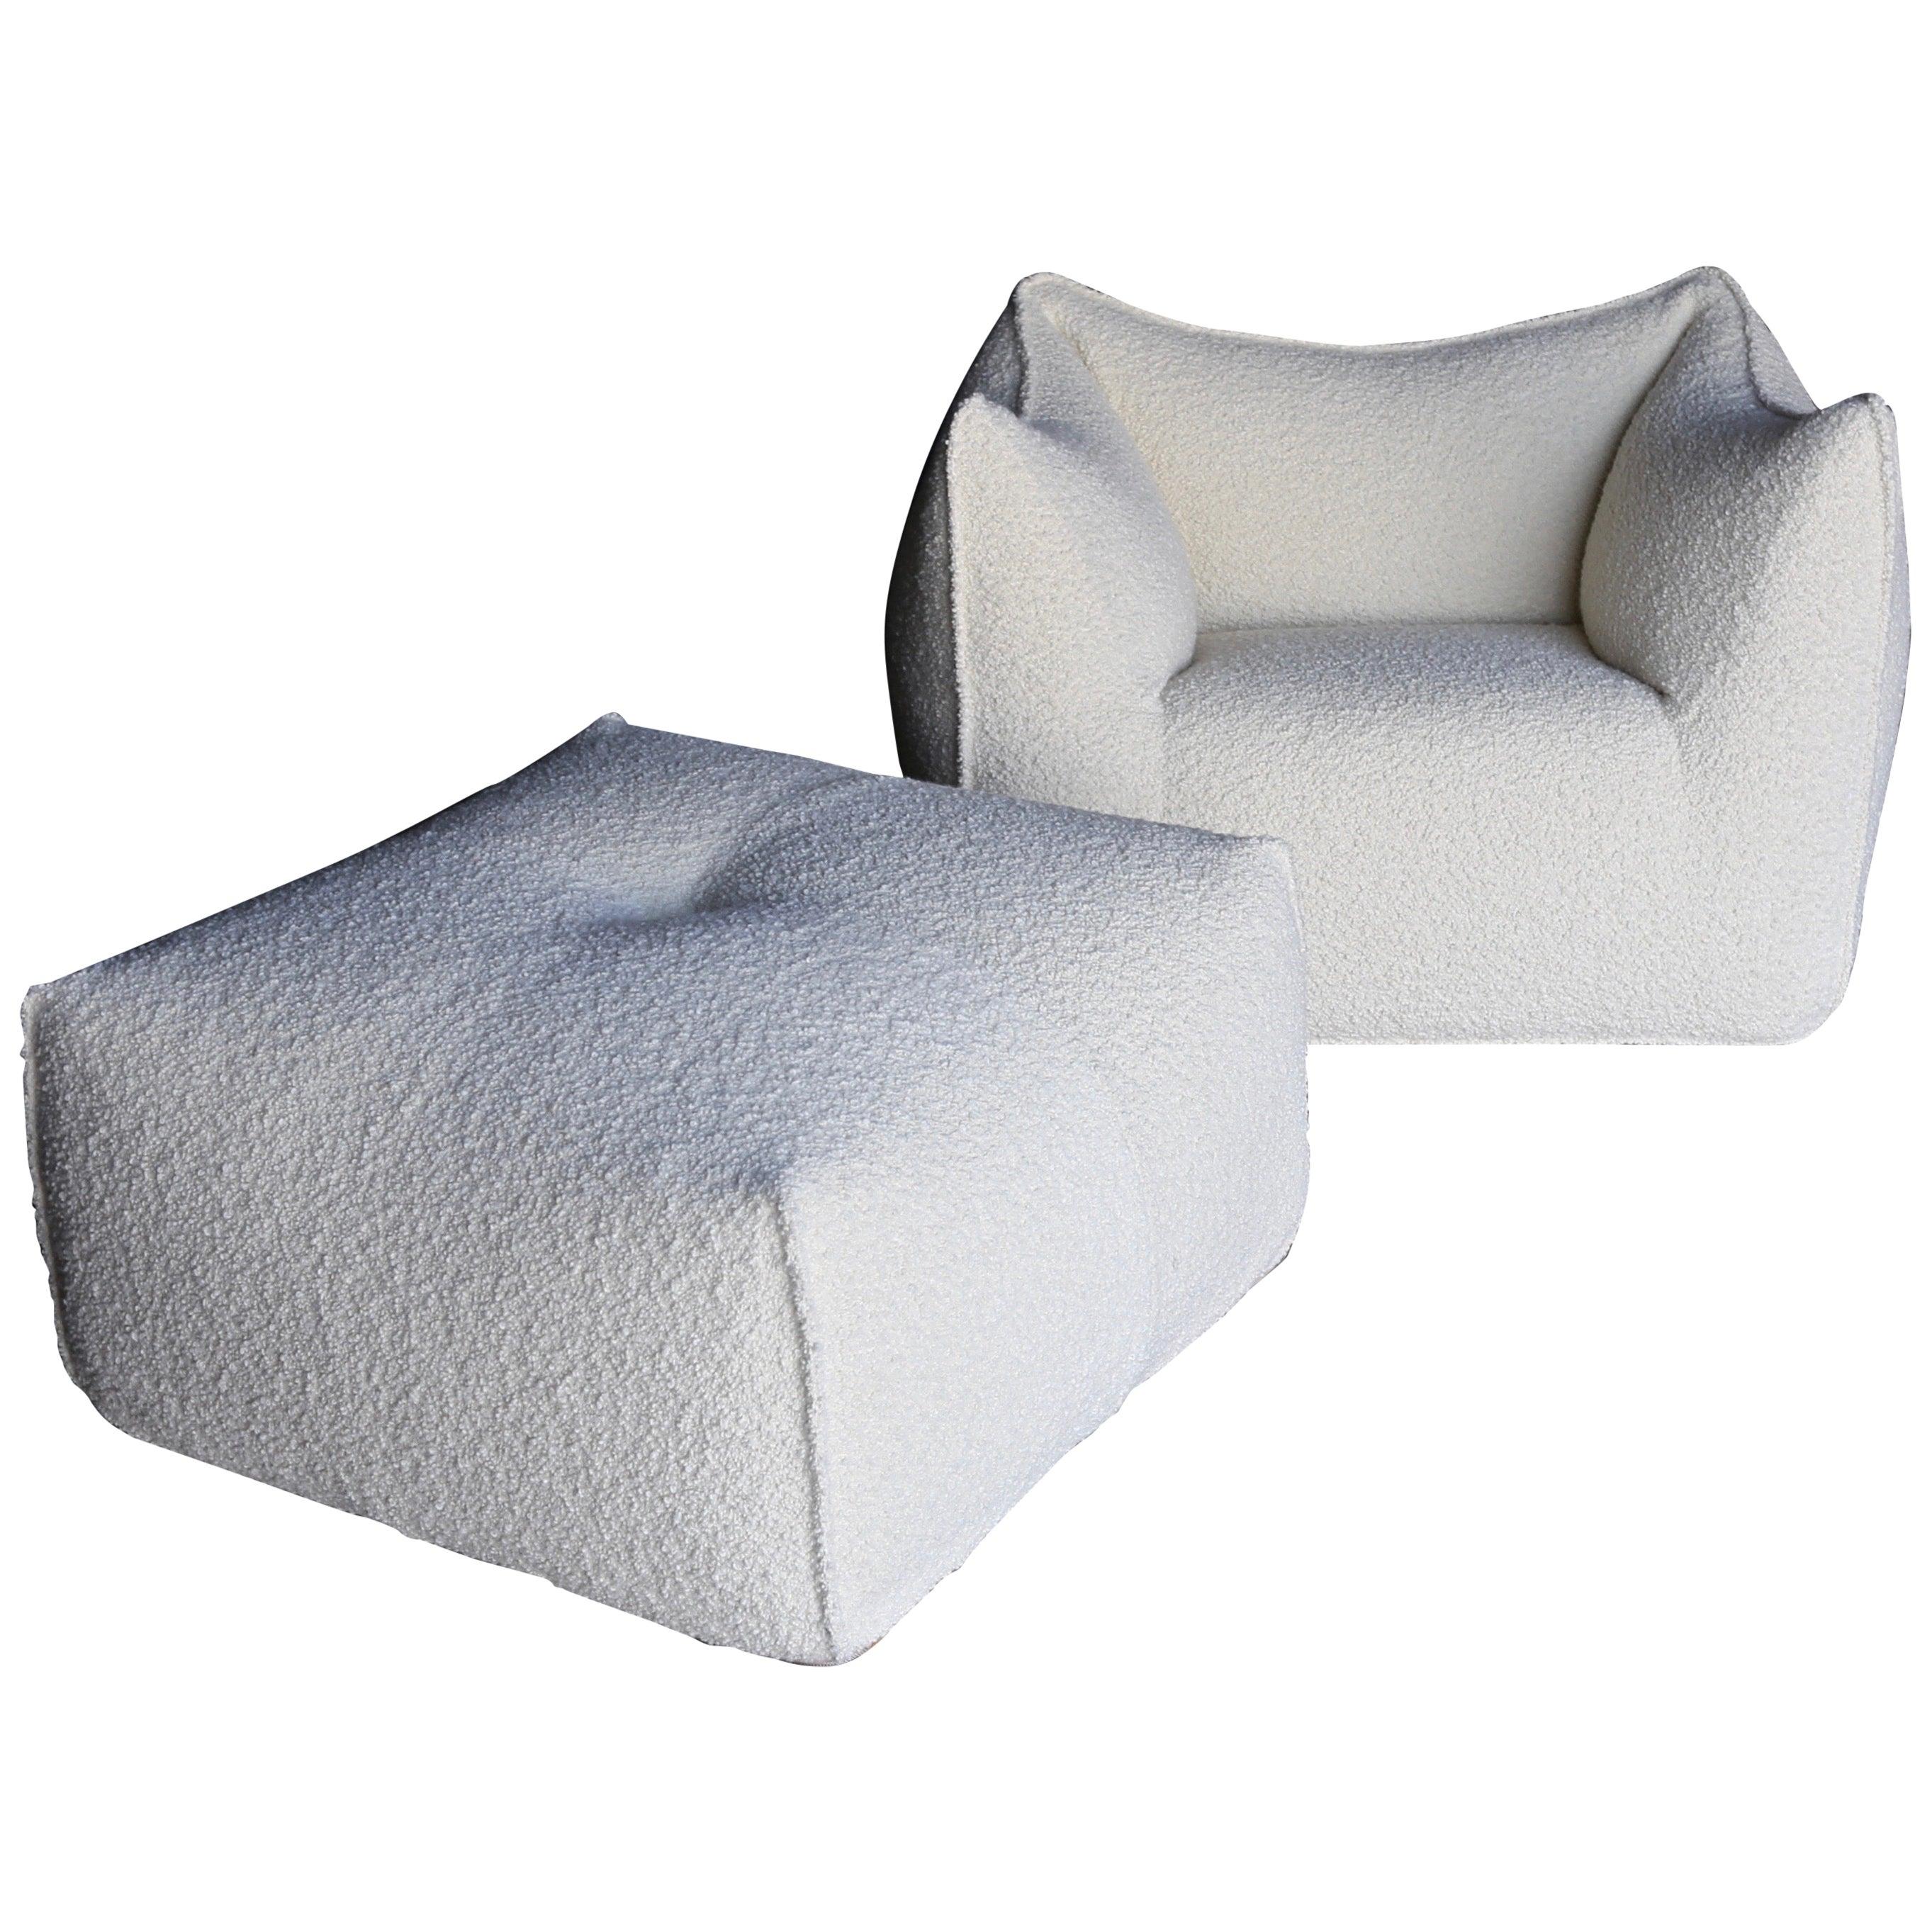 "Mario Bellini ""Le Bambole"" Lounge Chair & Ottoman for B&B Italia"